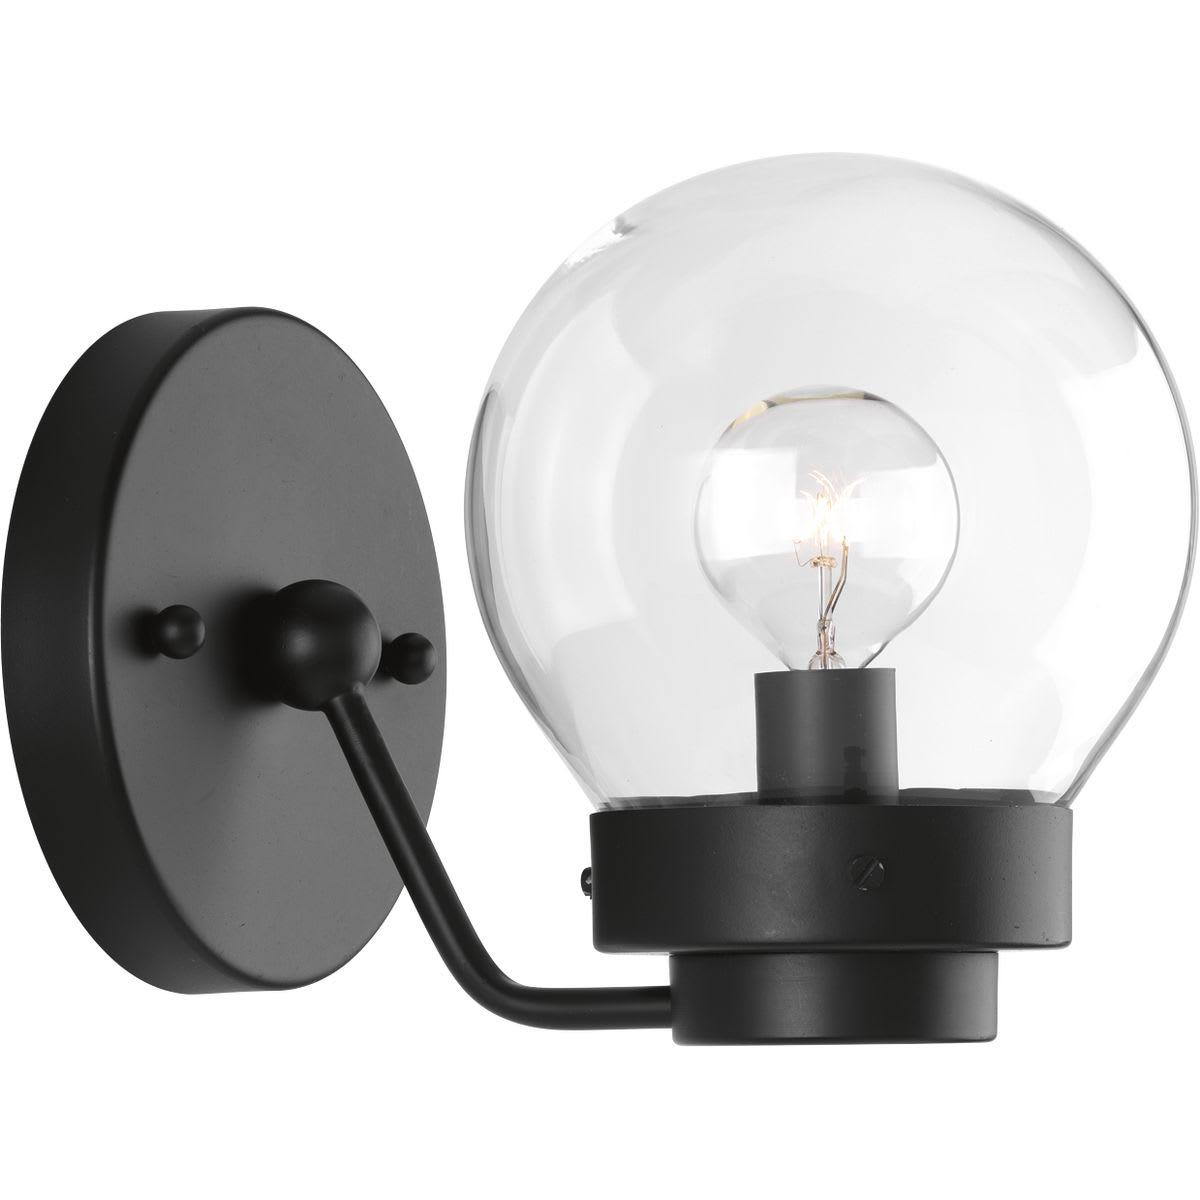 Image of: Progress Lighting P300112 031 Black Spatial Single Light 5 3 8 Wide Bathroom Sconce Faucet Com